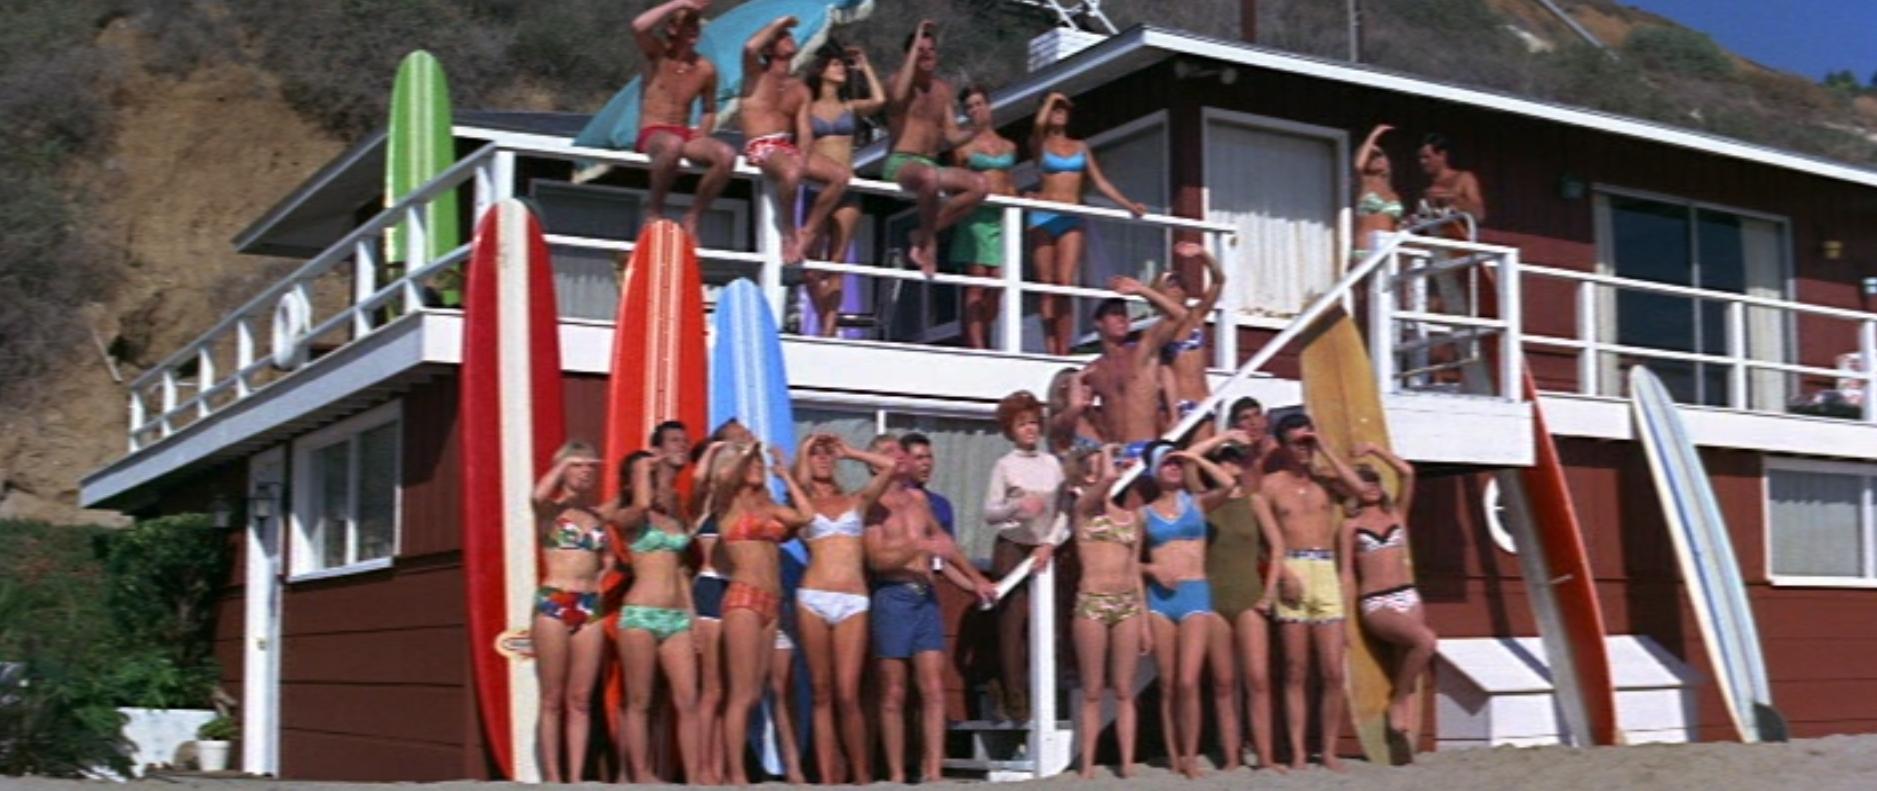 BeachBlanketBingo26